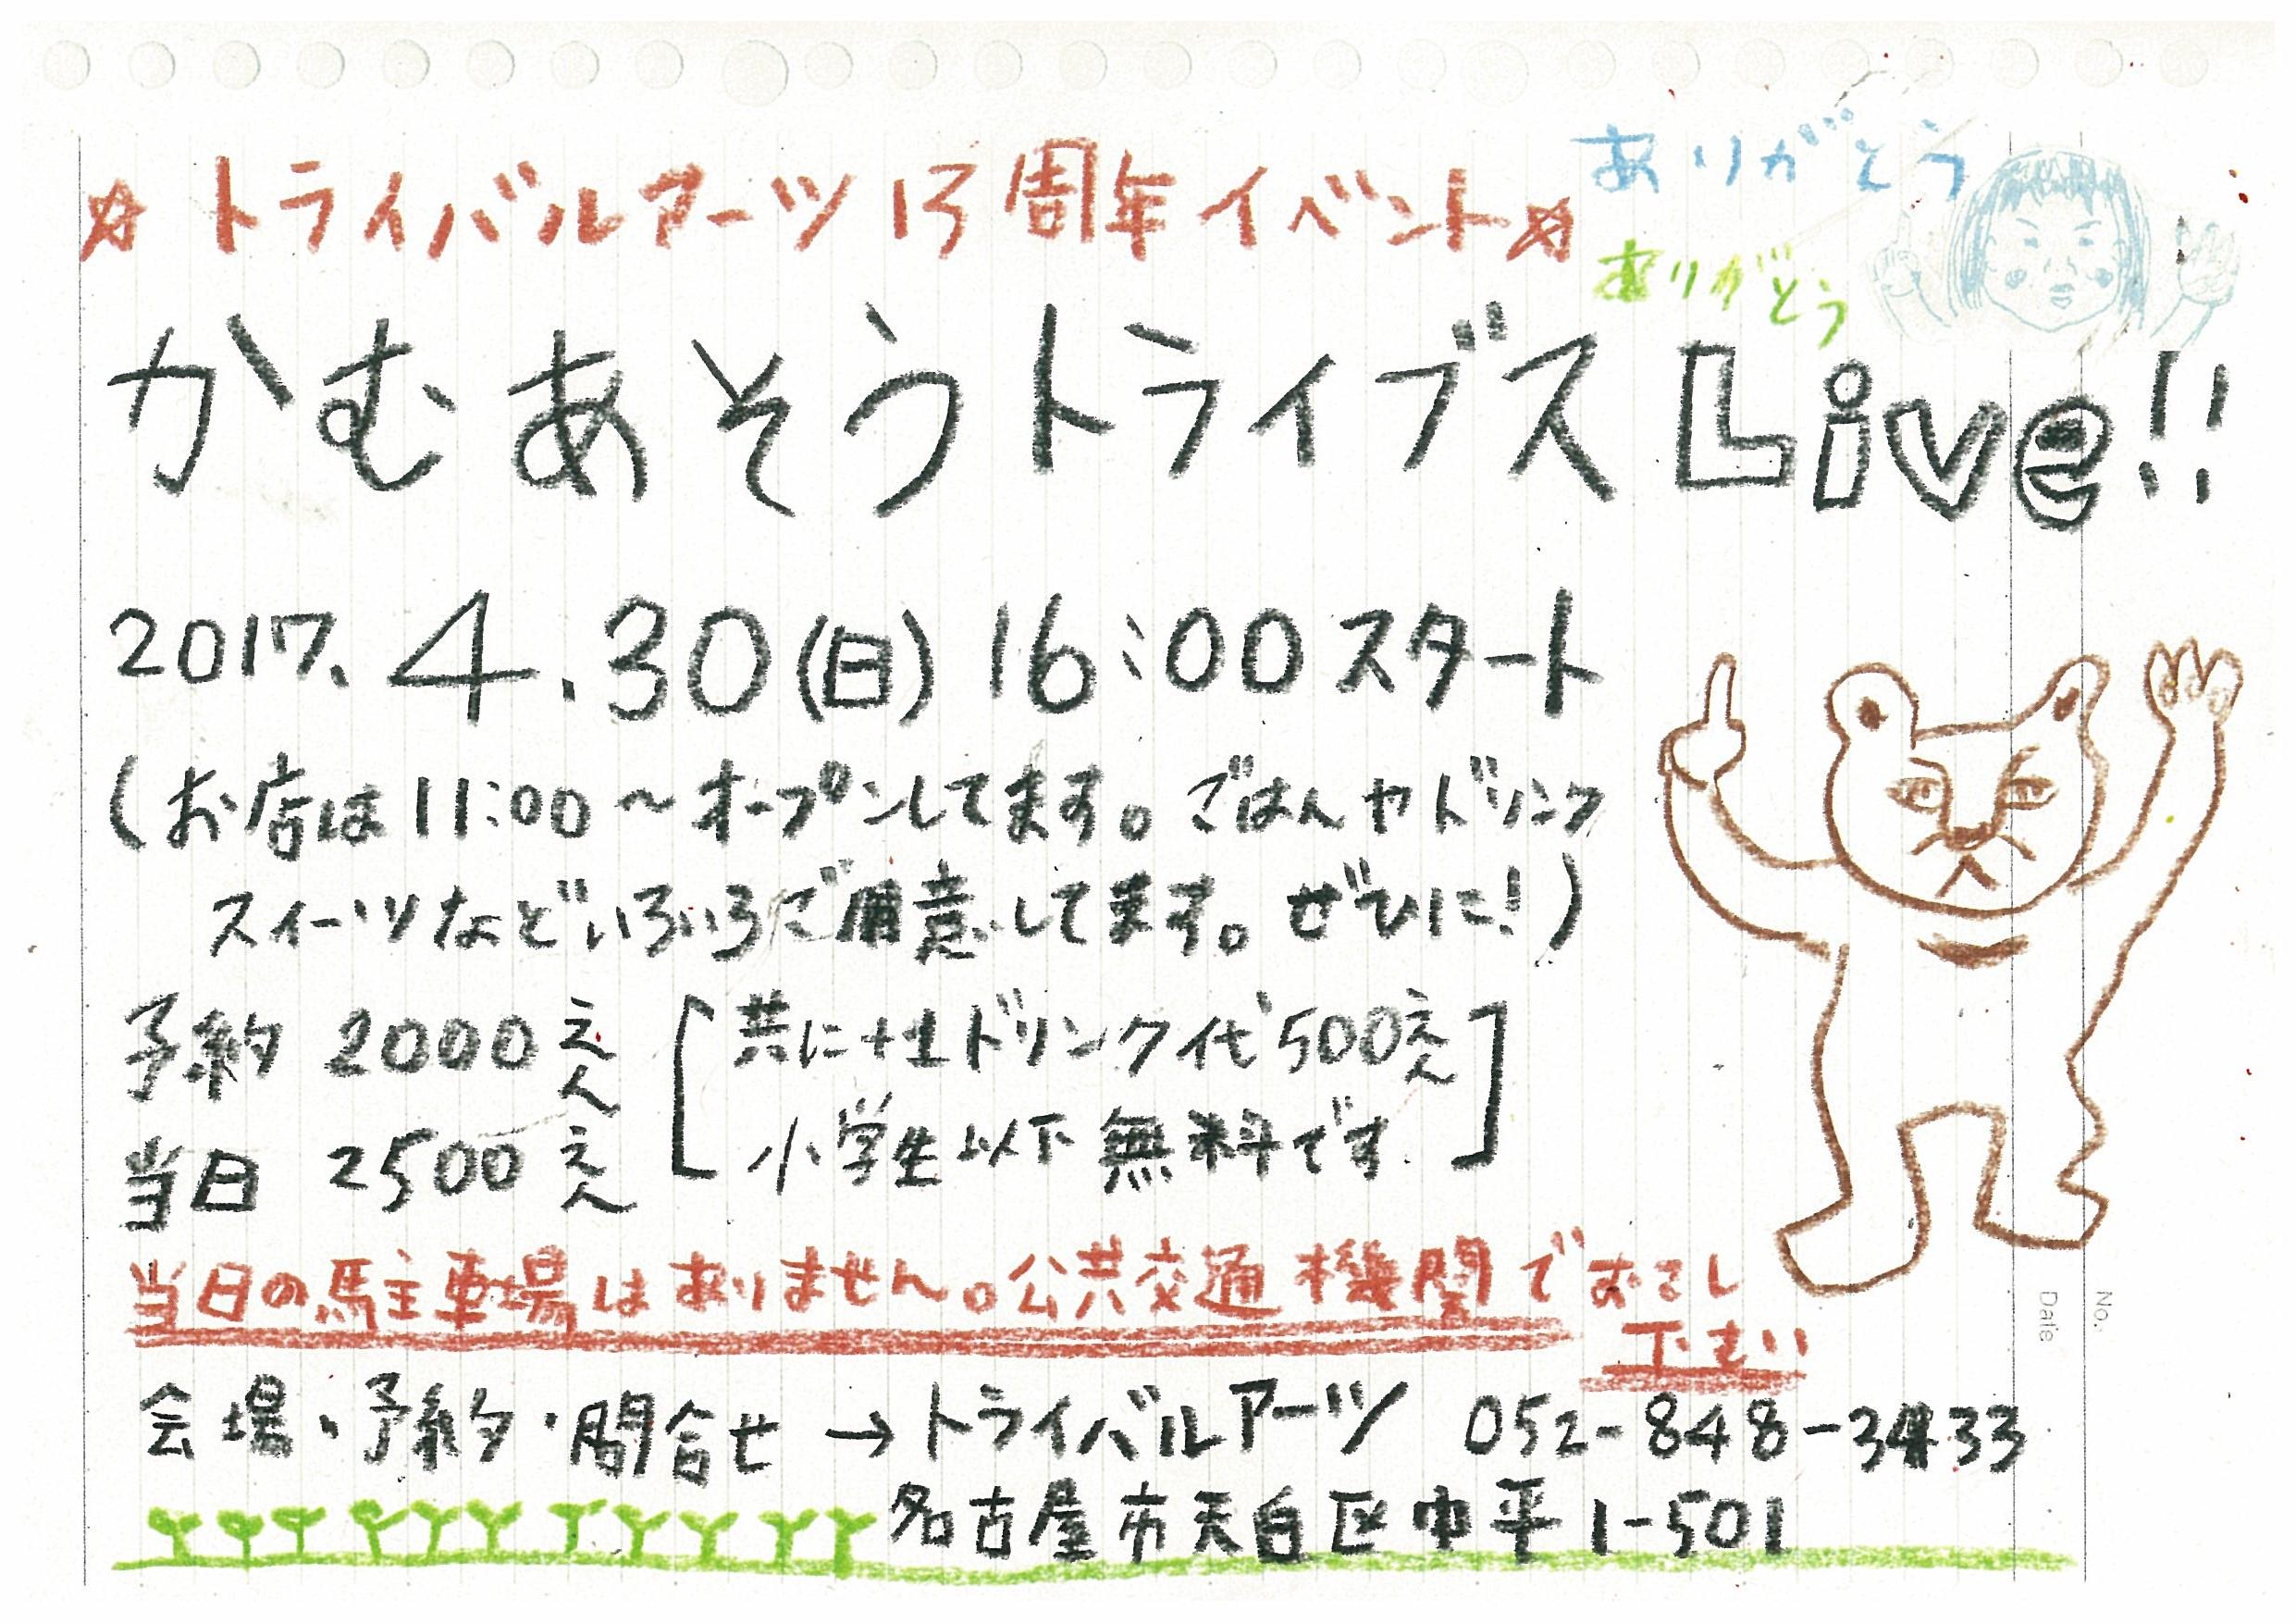 img-405162720-0001